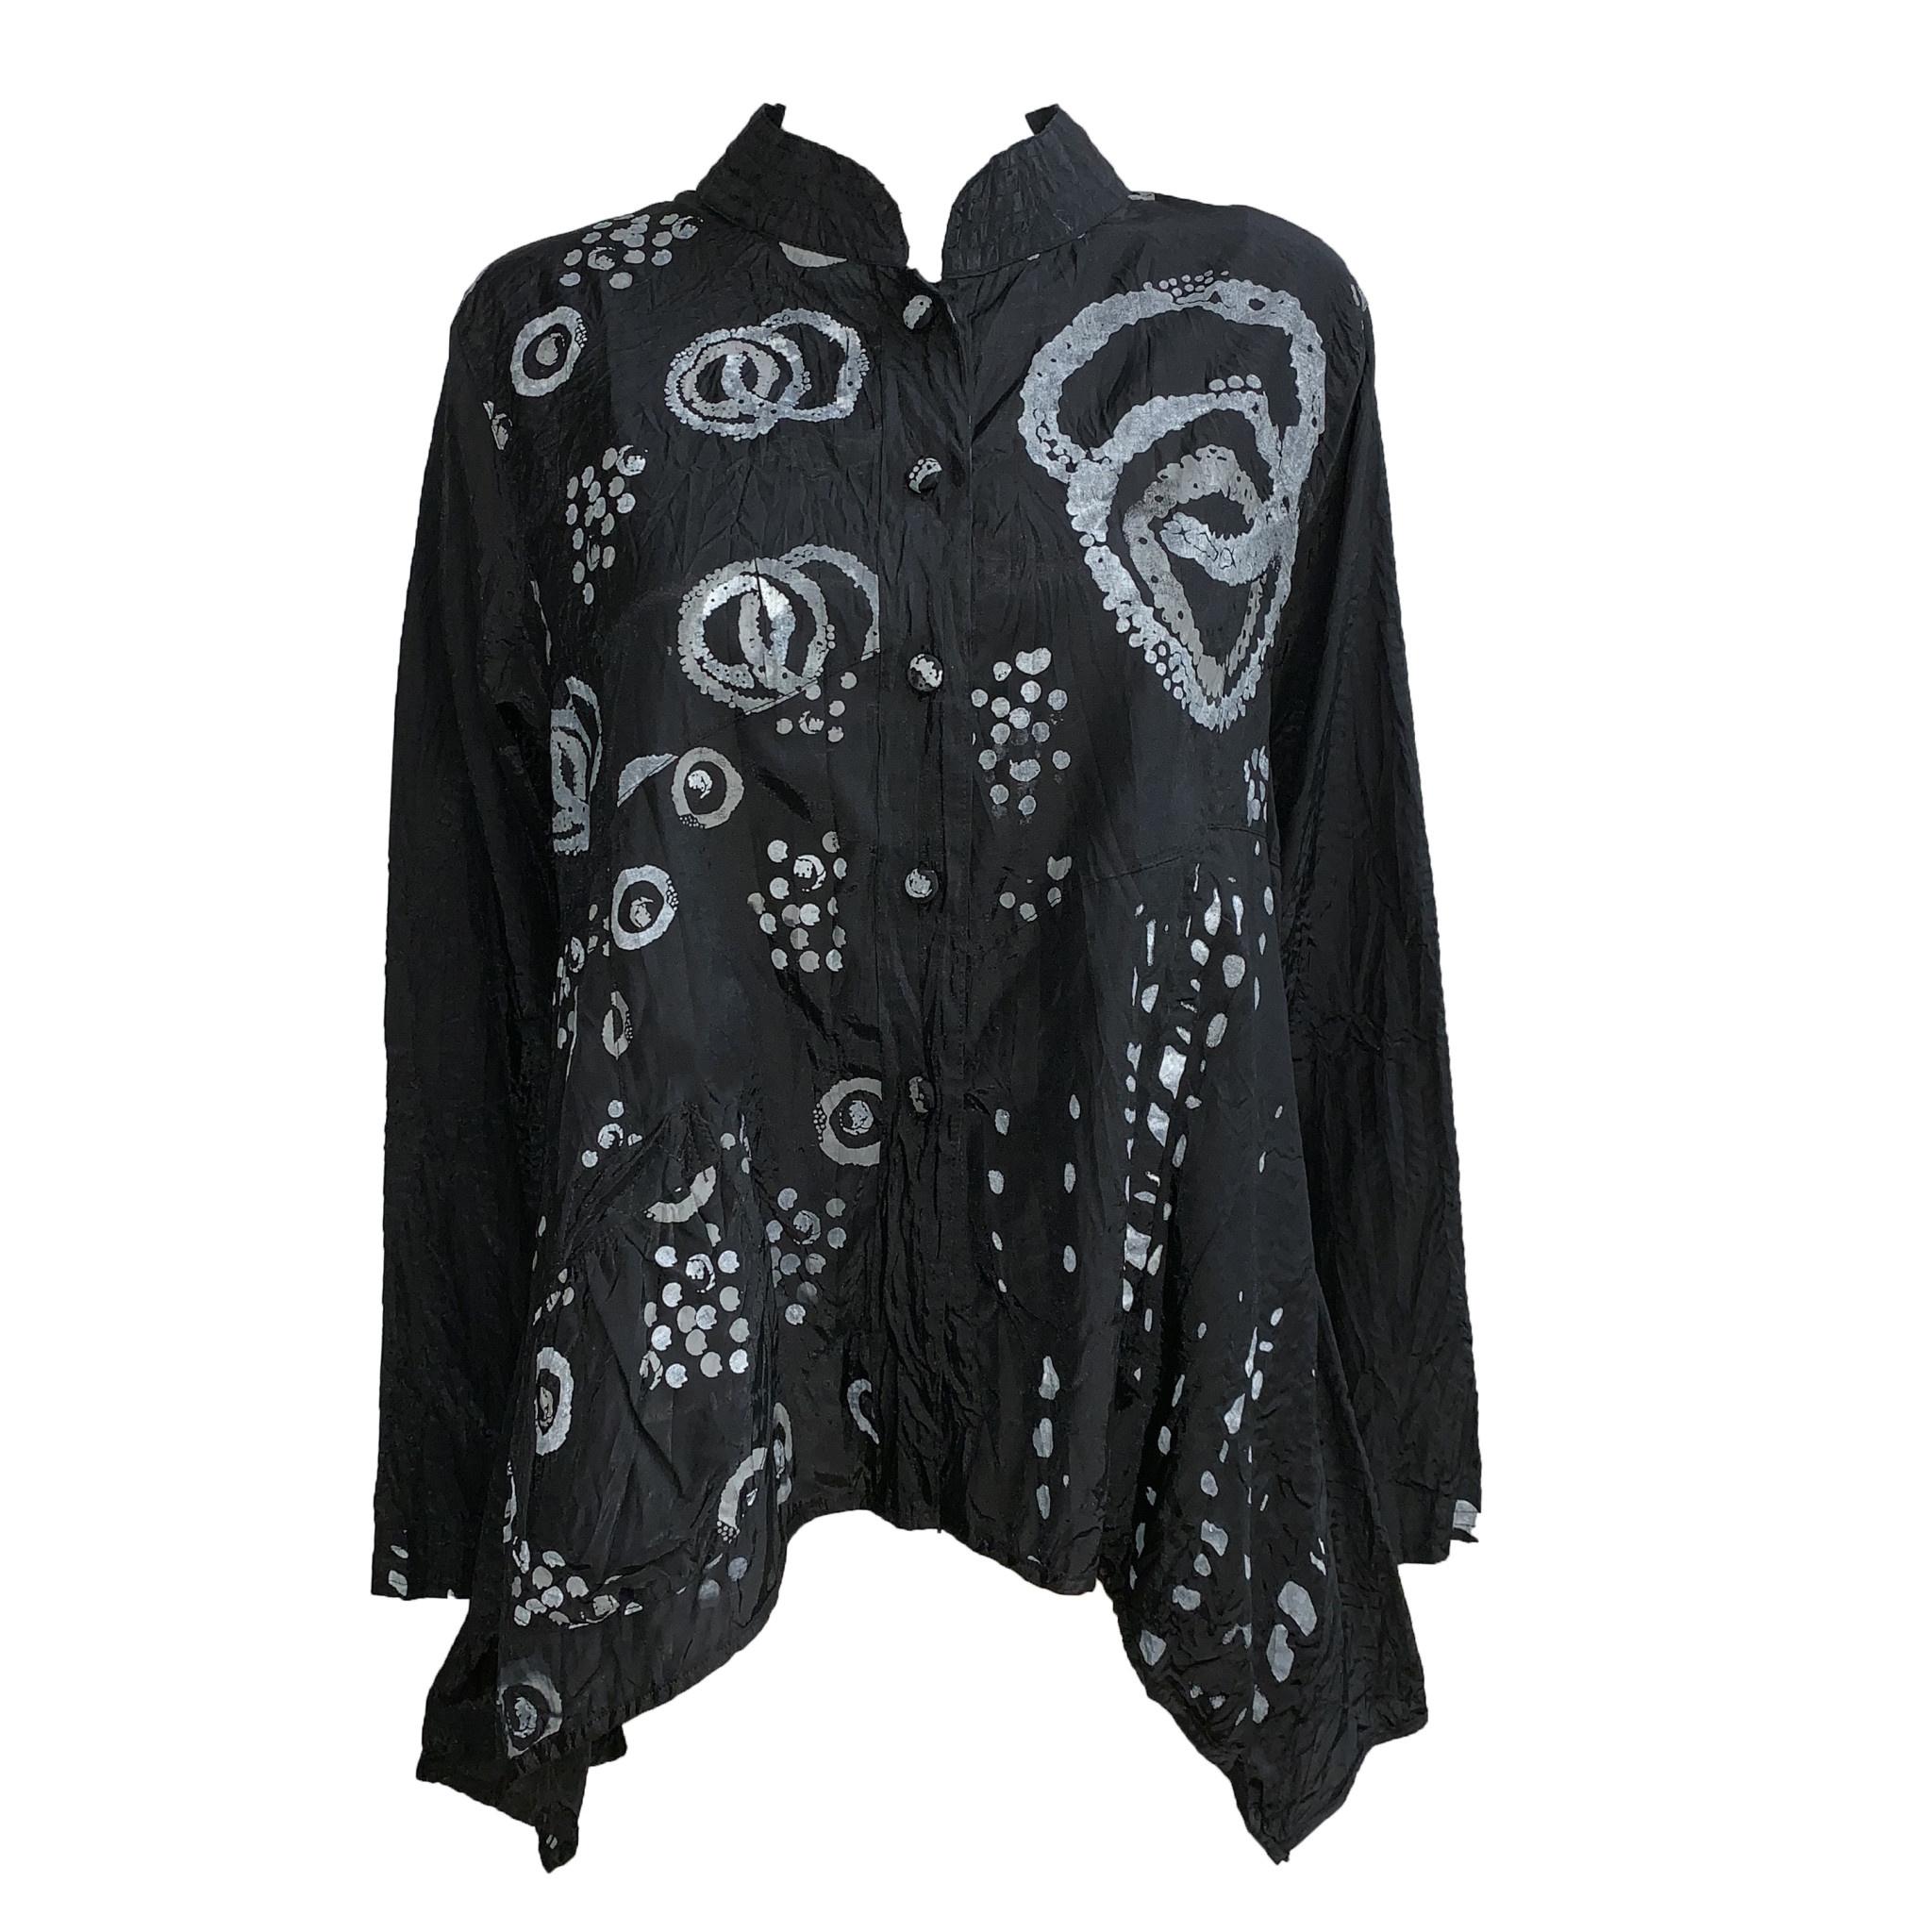 Harubella Harubella Mandarin Hi-Low Jacket - Black Print